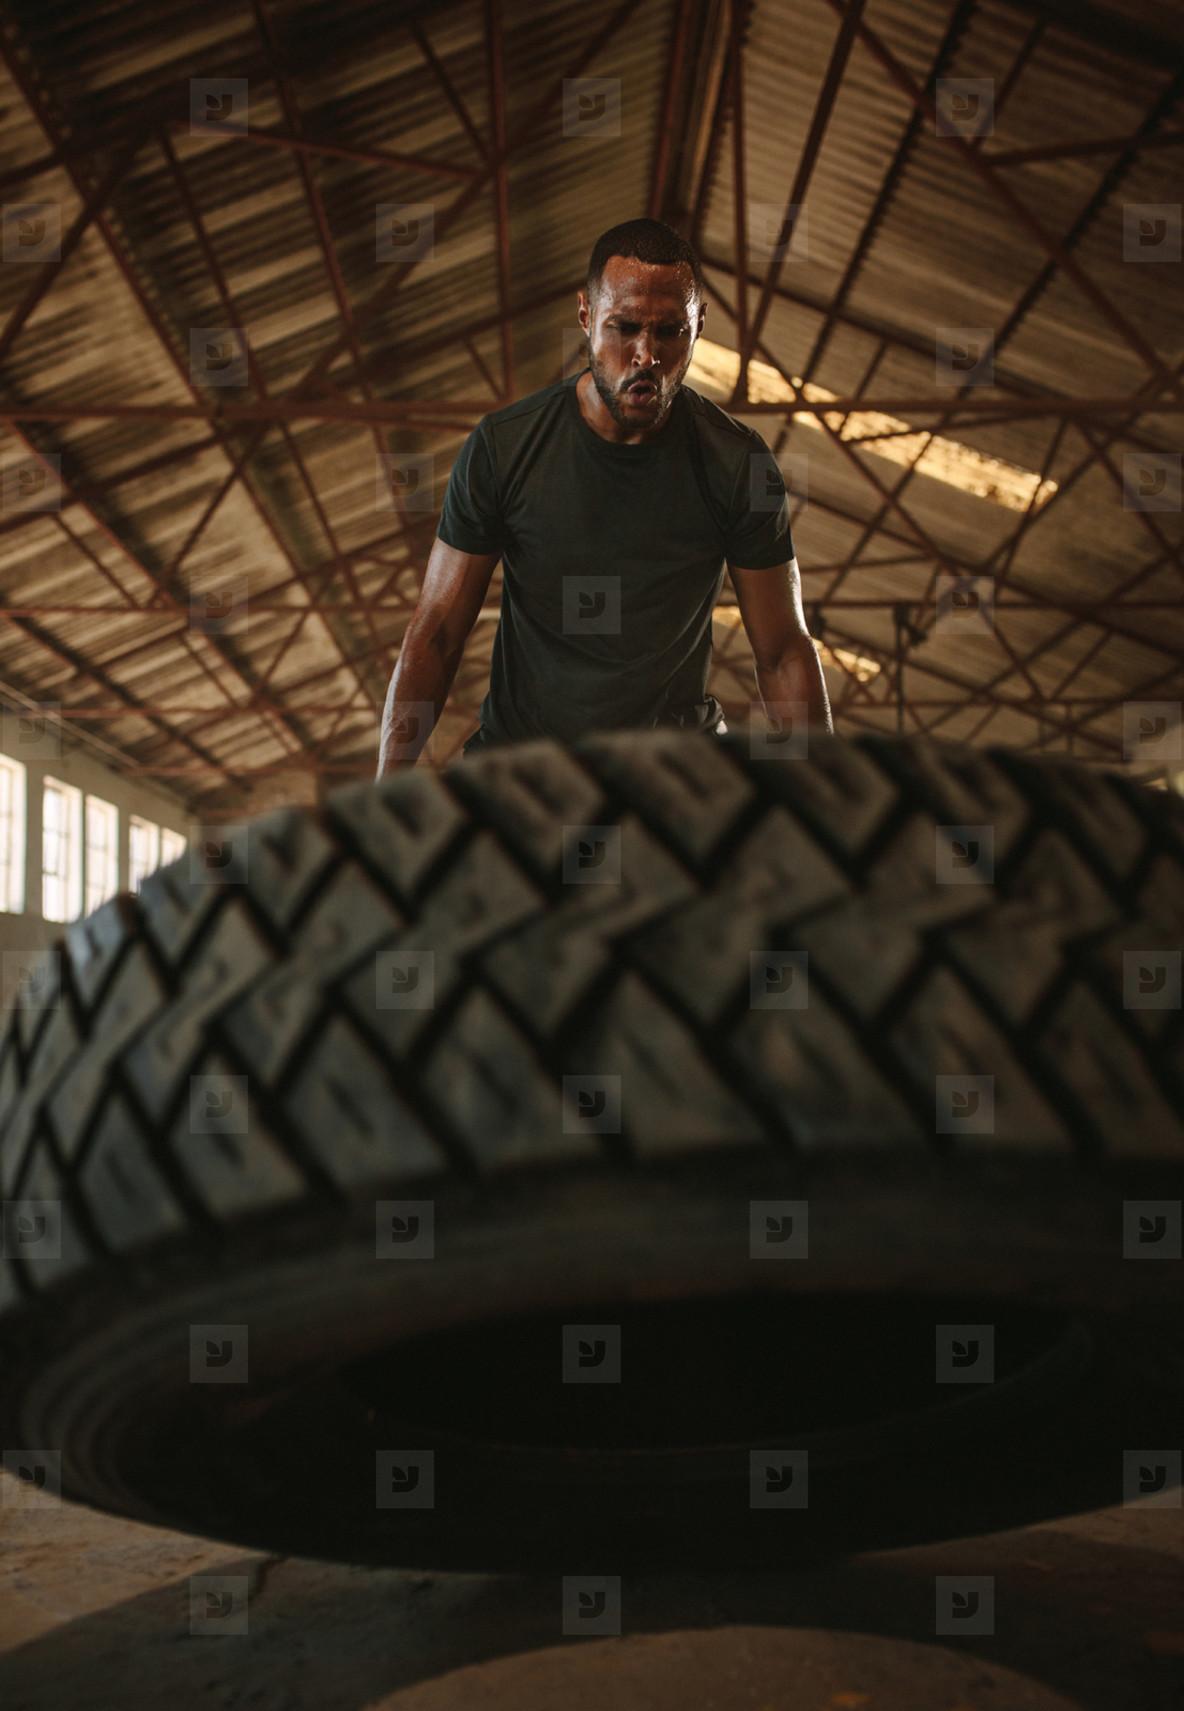 Muscular man doing cross training inside old warehouse